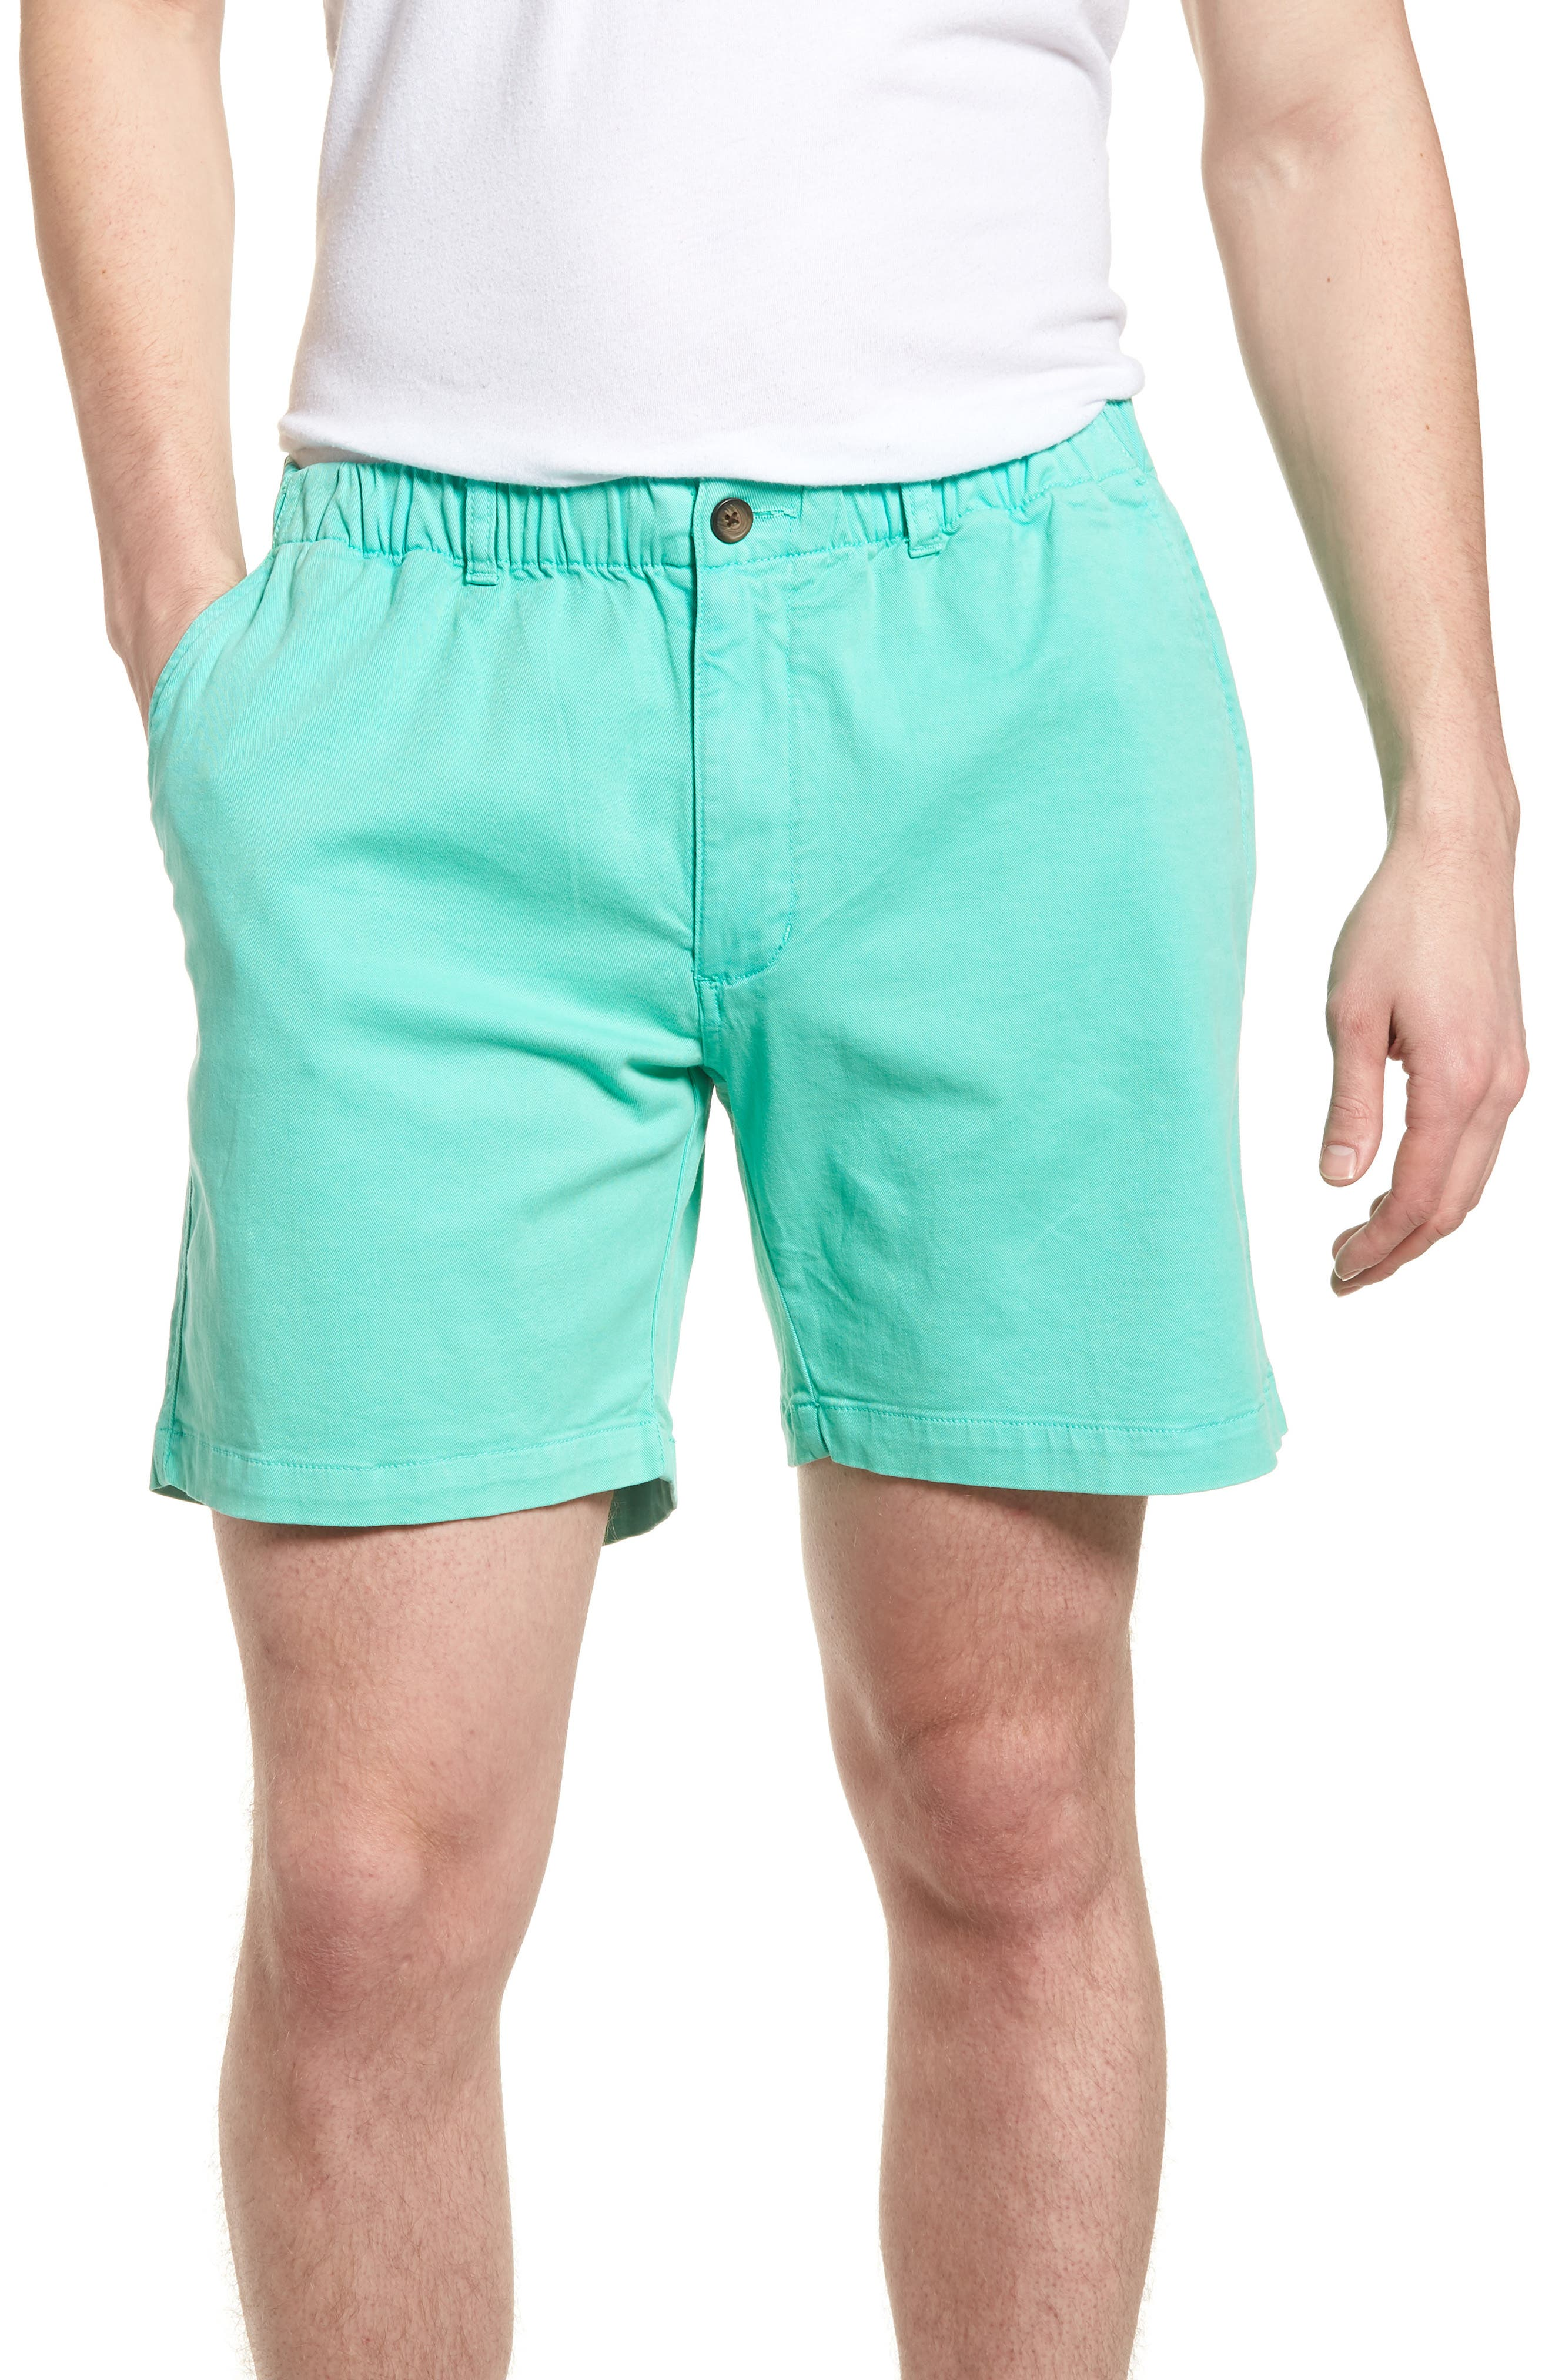 VINTAGE 1946 7In Snappers Elastic Waist Shorts in Aqua